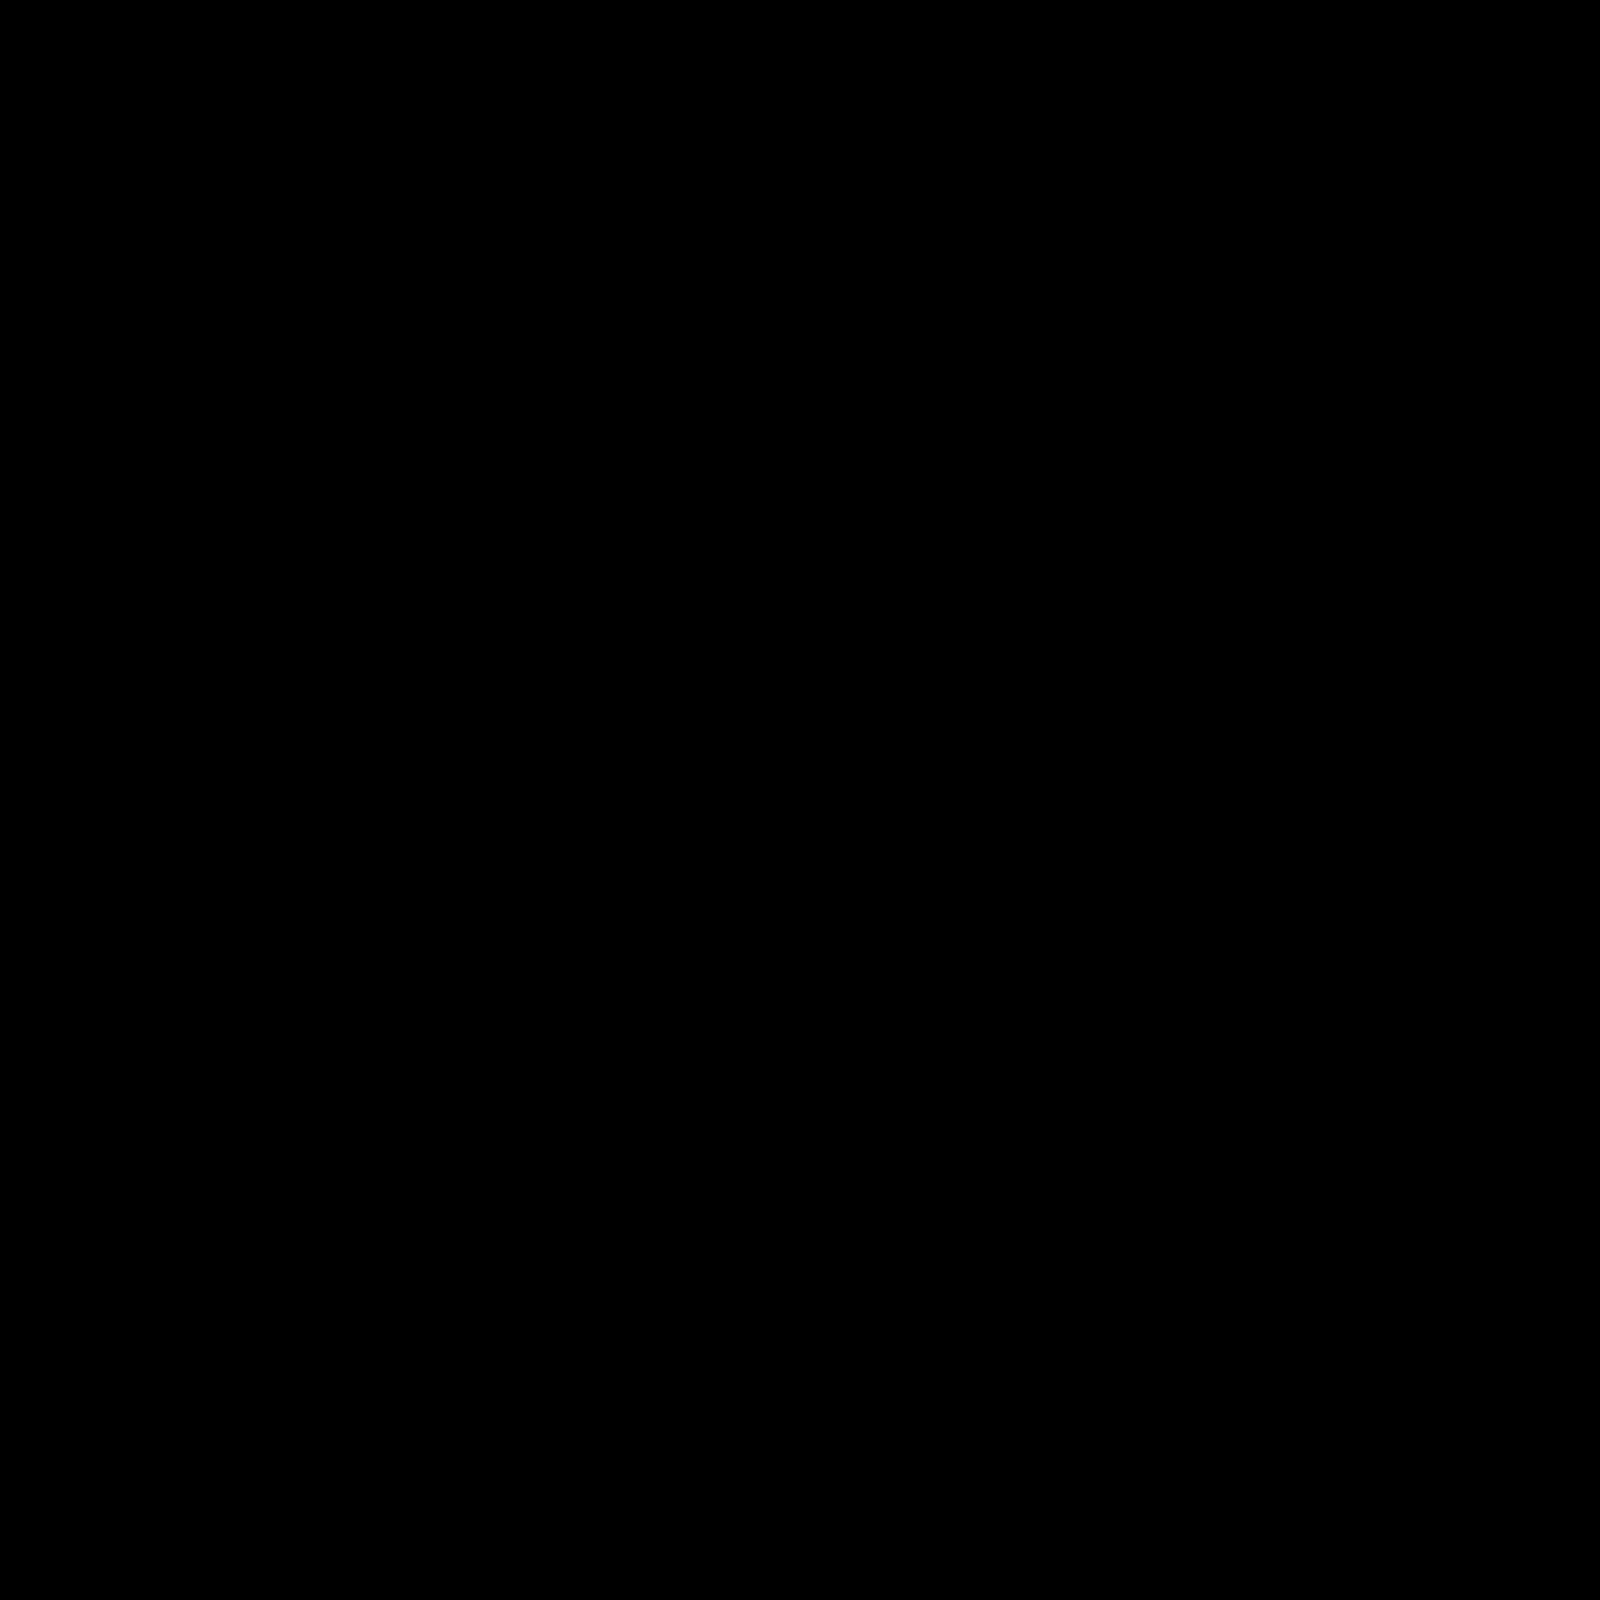 Mini Bar Filled icon